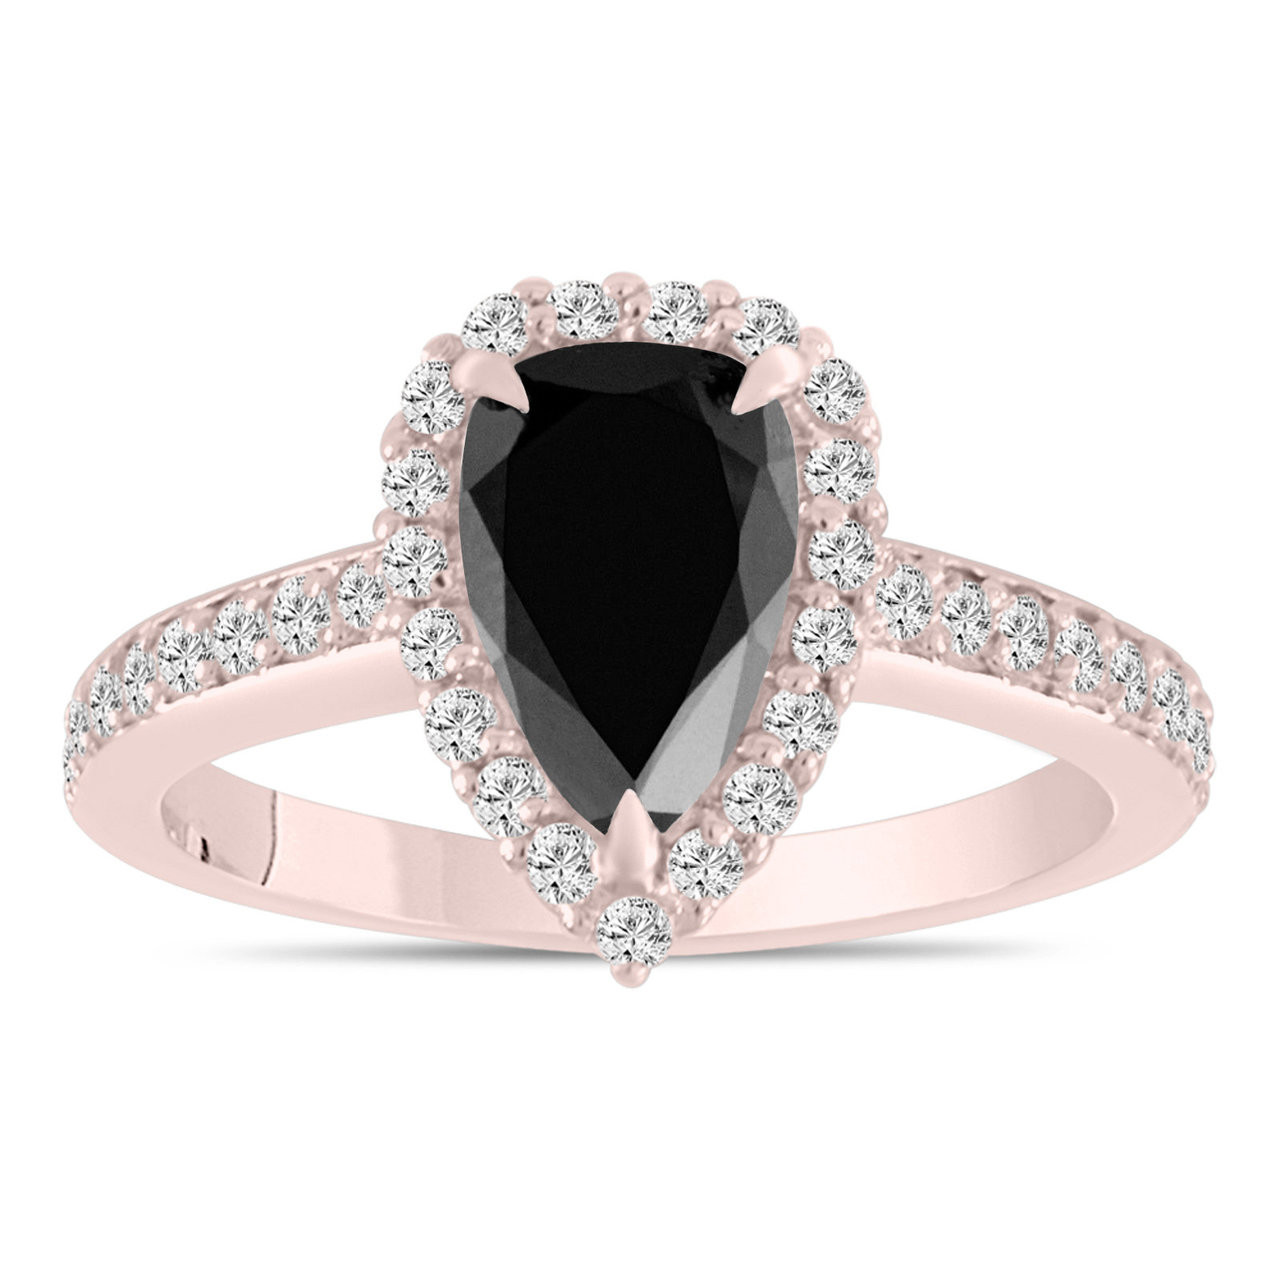 2 Carat Pear Shaped Black Diamond Engagement Ring Rose Gold Black Diamond Wedding Ring Halo Bridal Ring Unique Handmade Certified